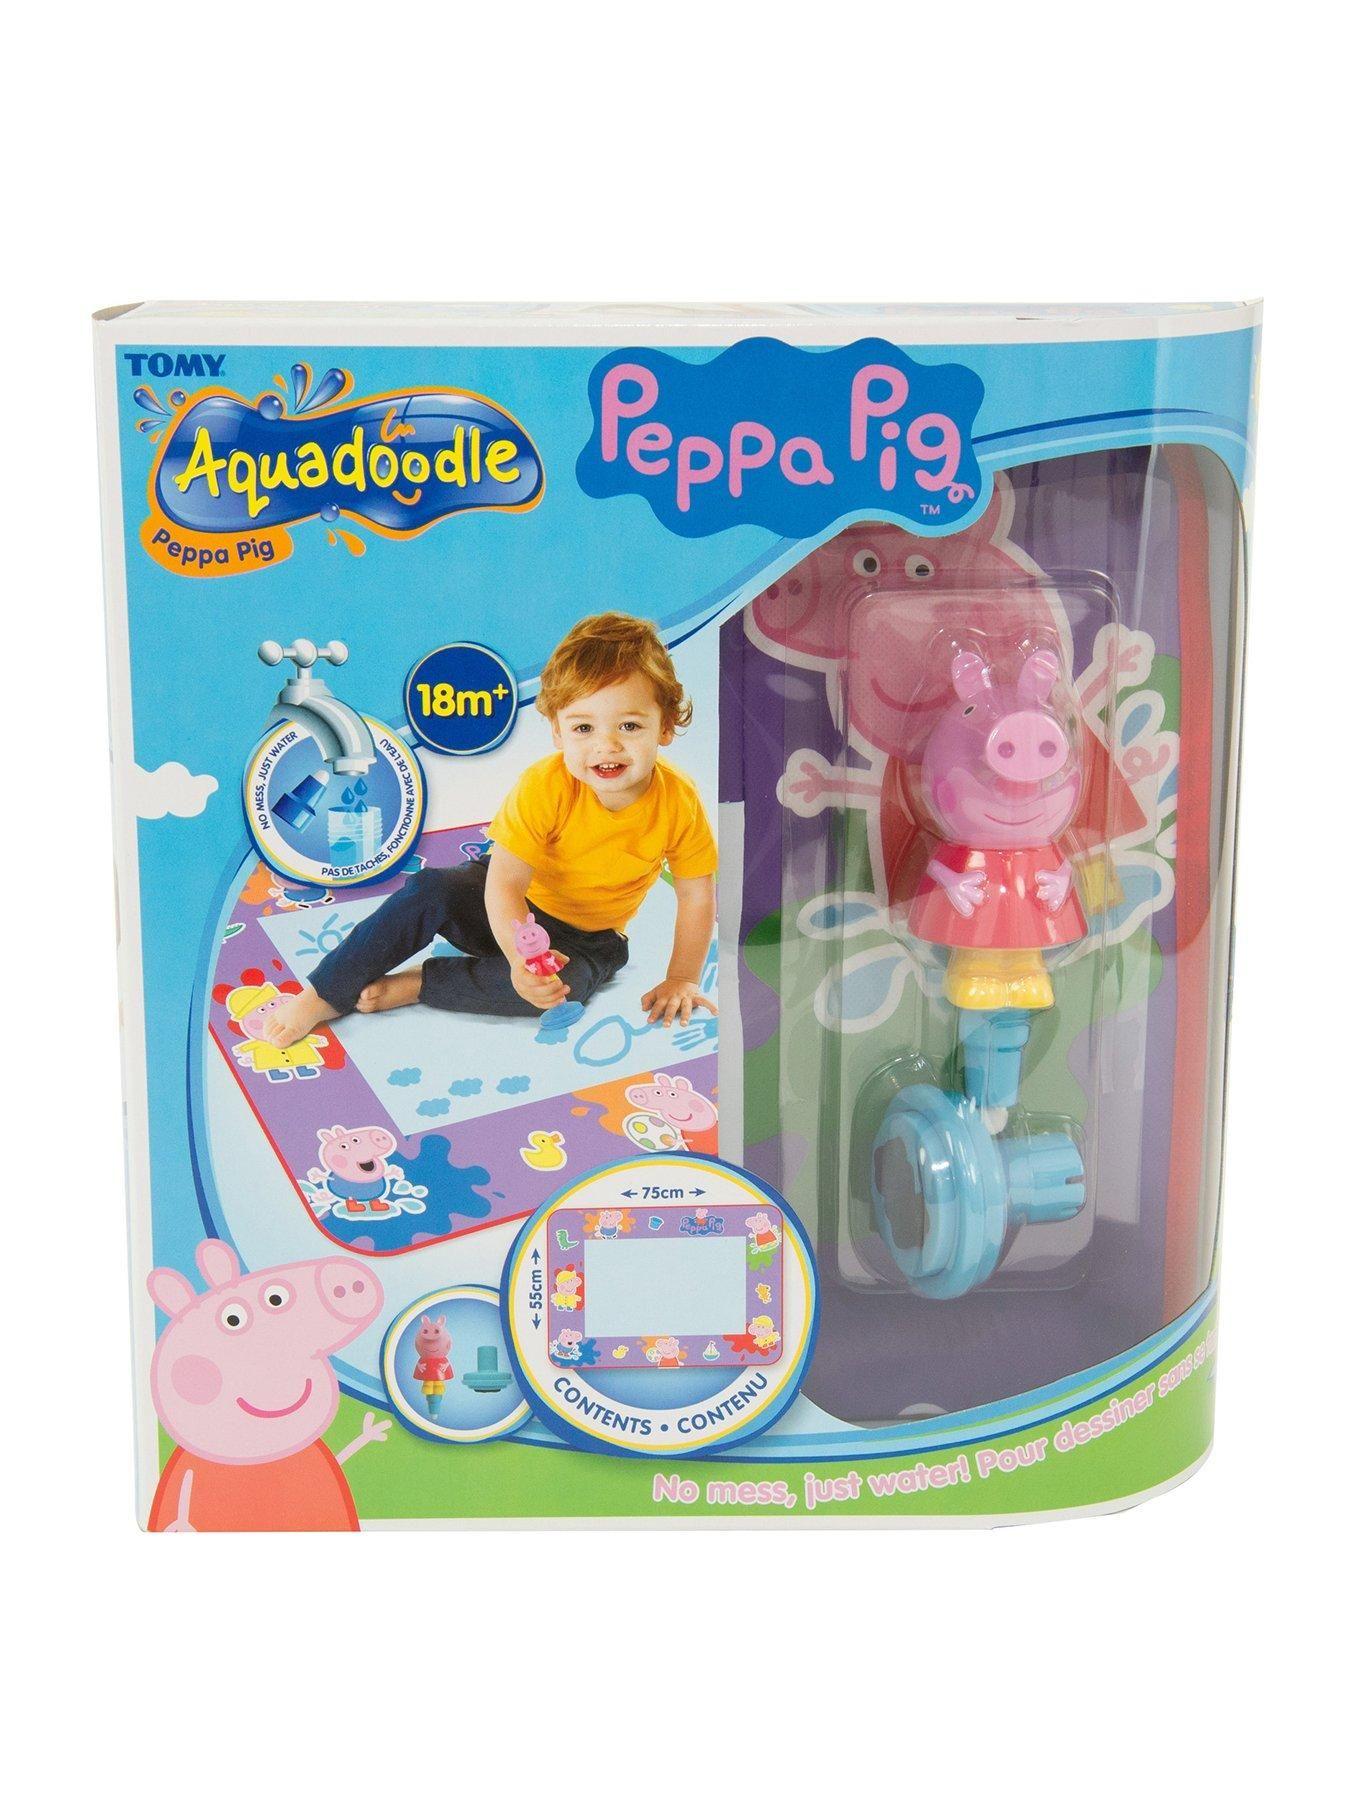 Peppa Pig Aquadoodle Peppa pig, Pig crafts, Pig character